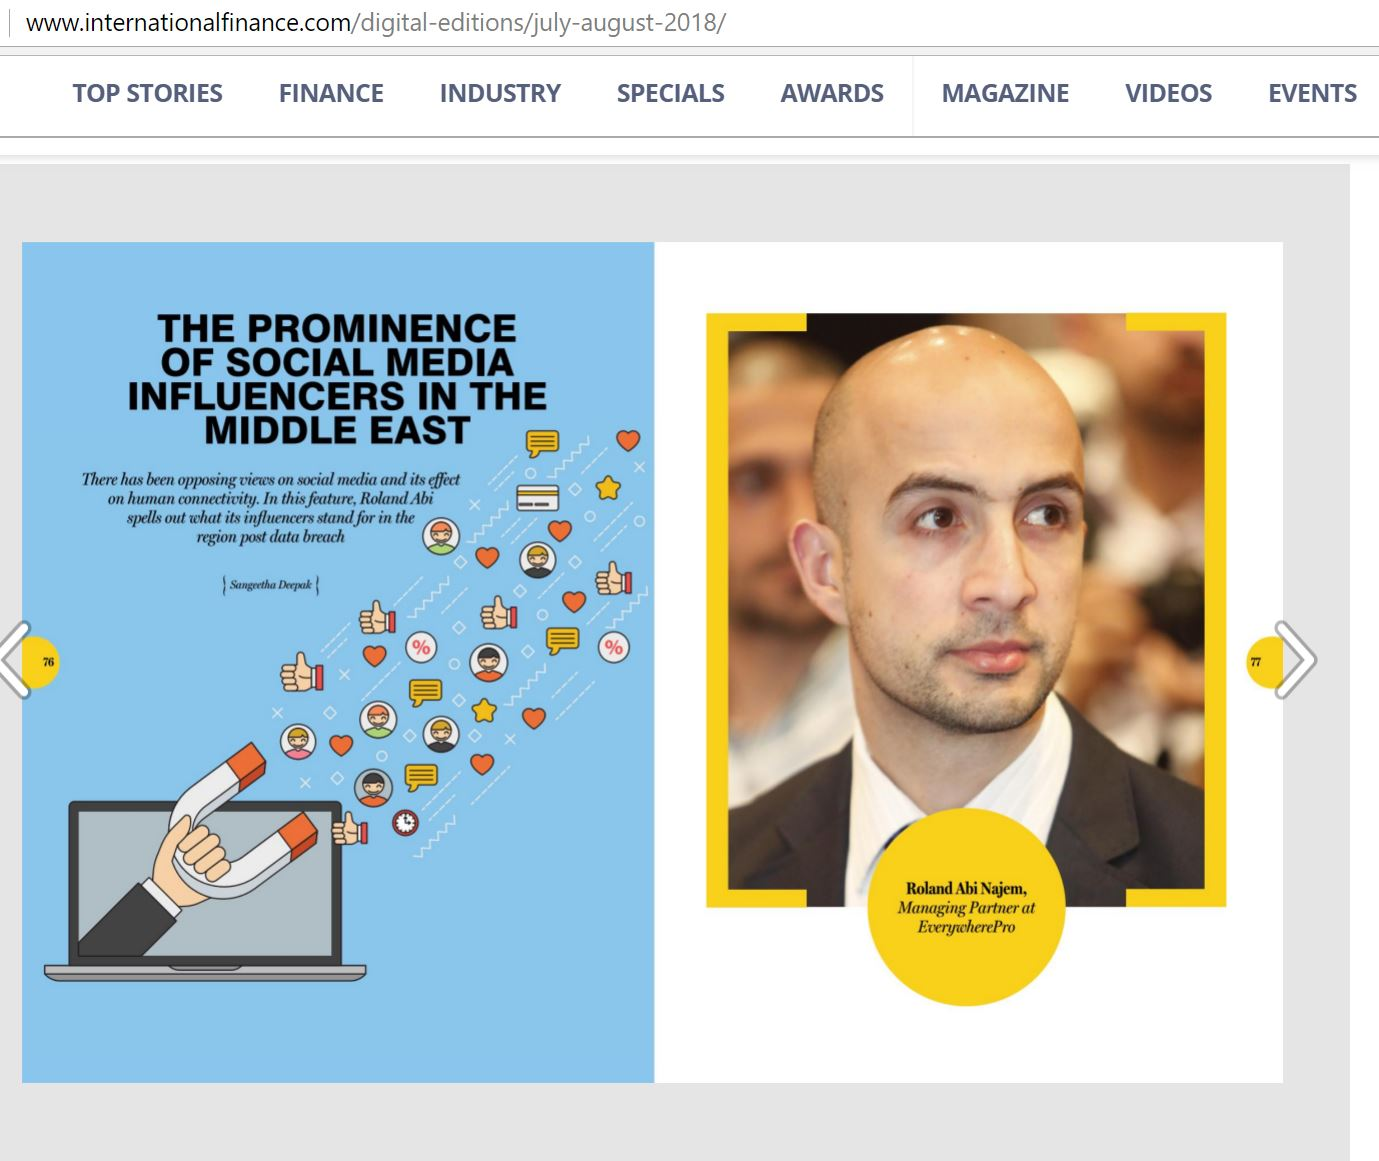 Roland Abi Najem interview in International Finance Magazine